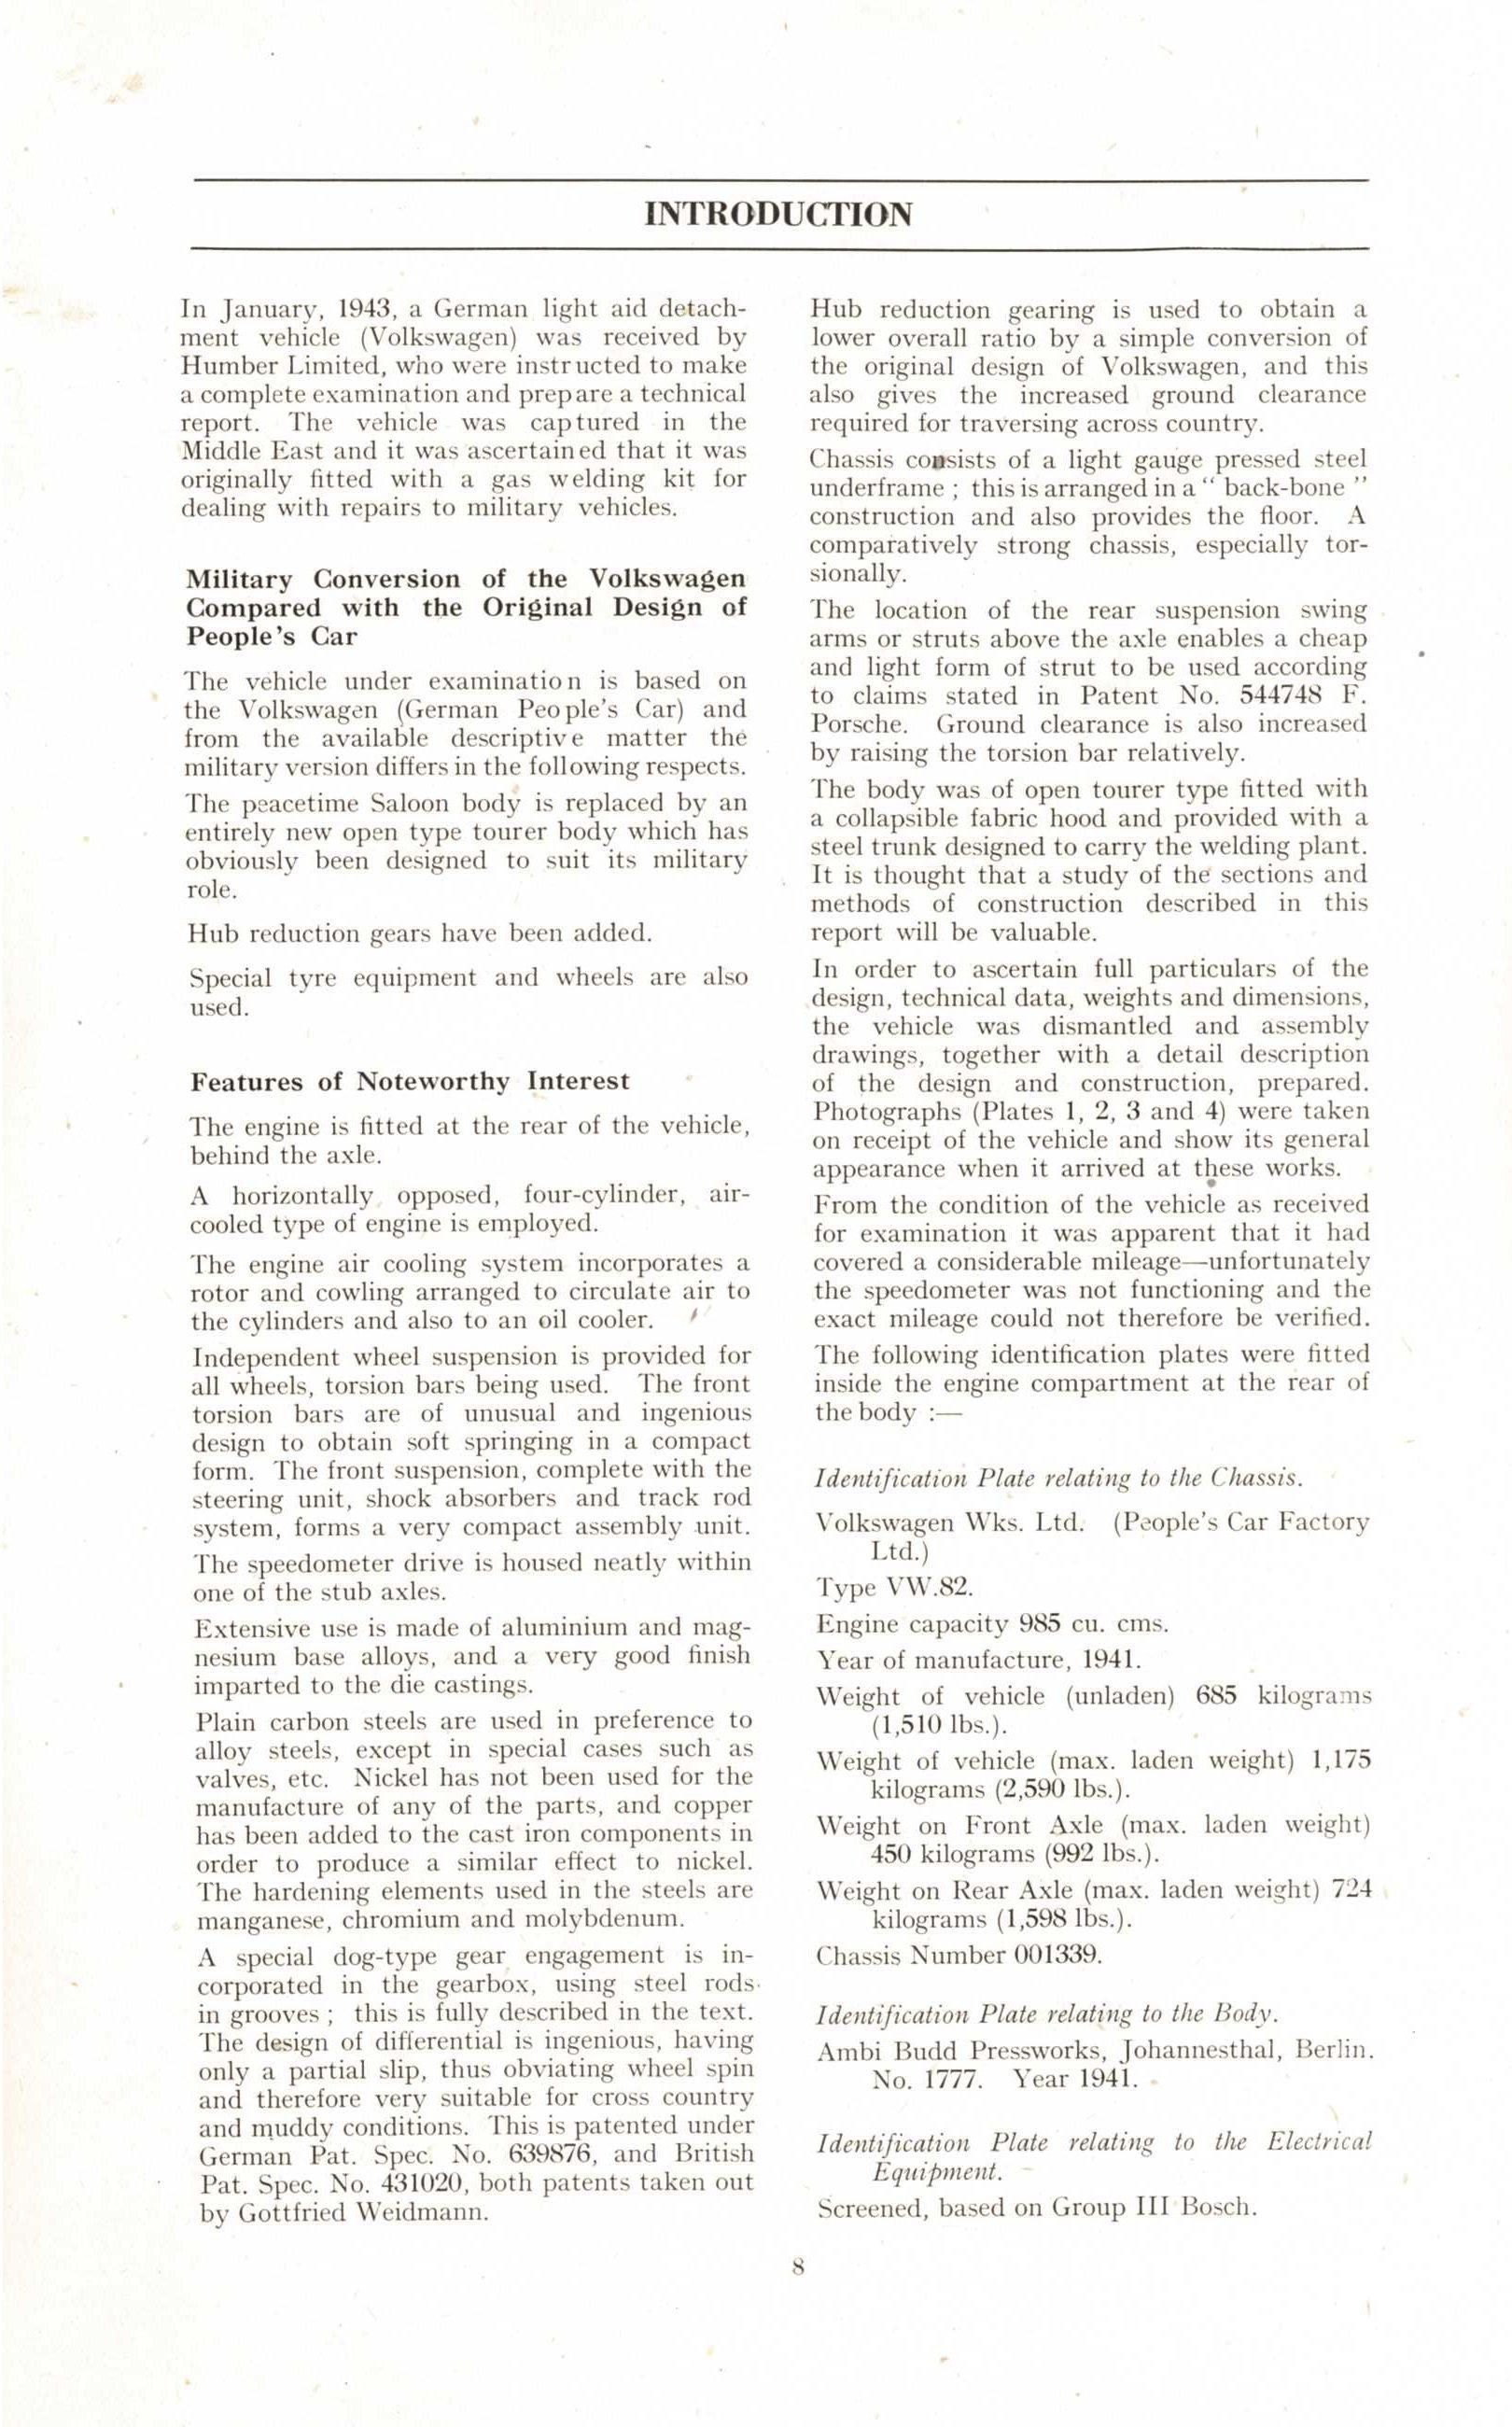 TheSamba com :: 1943 Rootes Group / Humber Ltd  VW Type 82